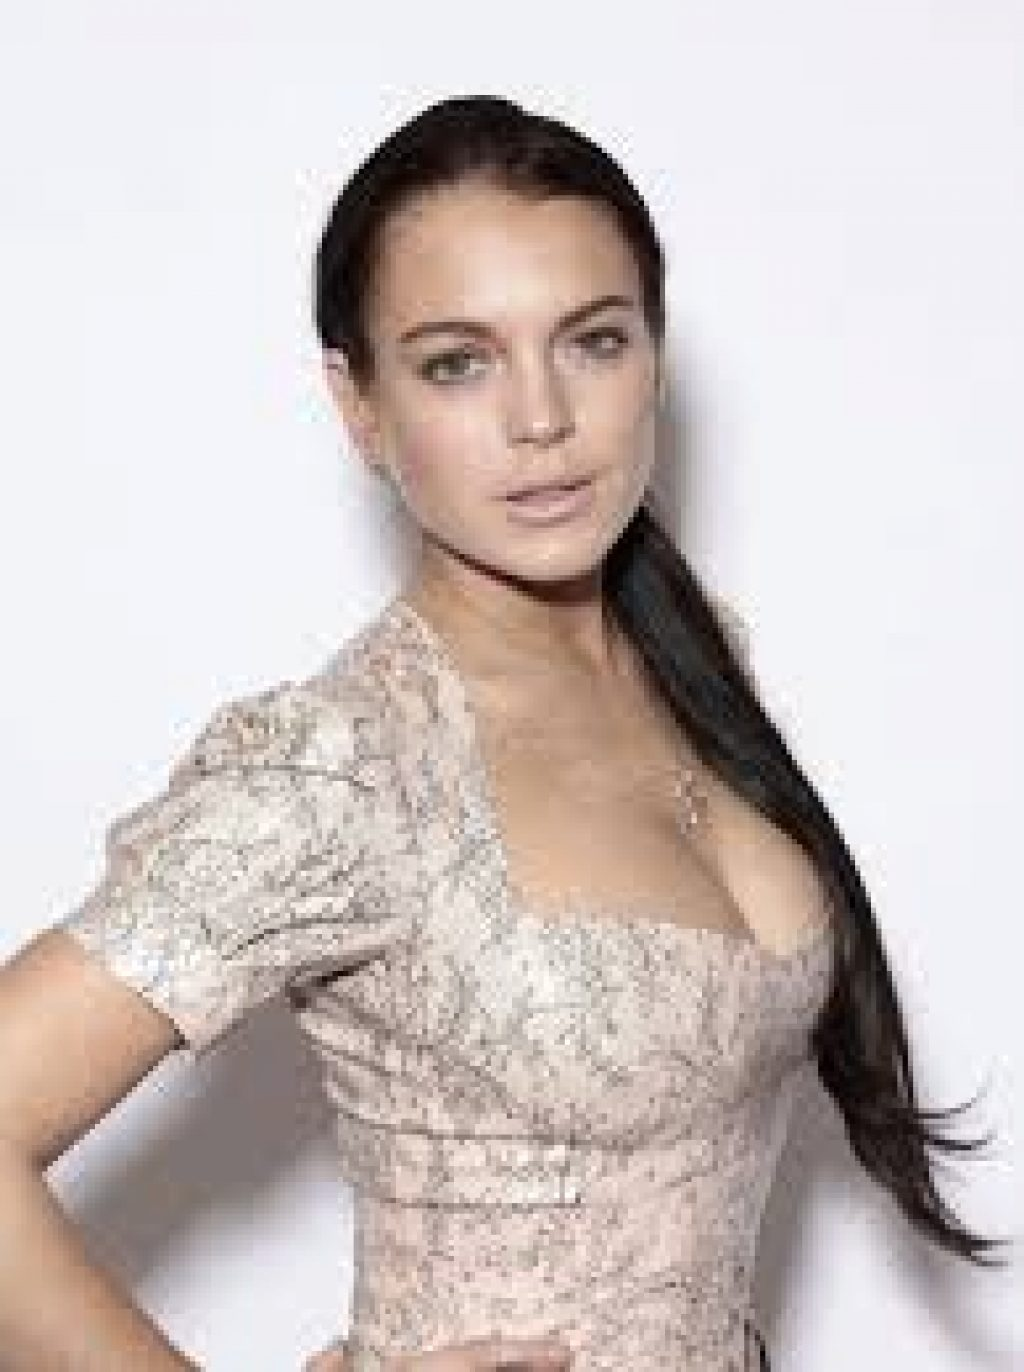 Chronisch eifersüchtig - oder verzweifelt? Lindsay Lohan c/o theplace2.ru